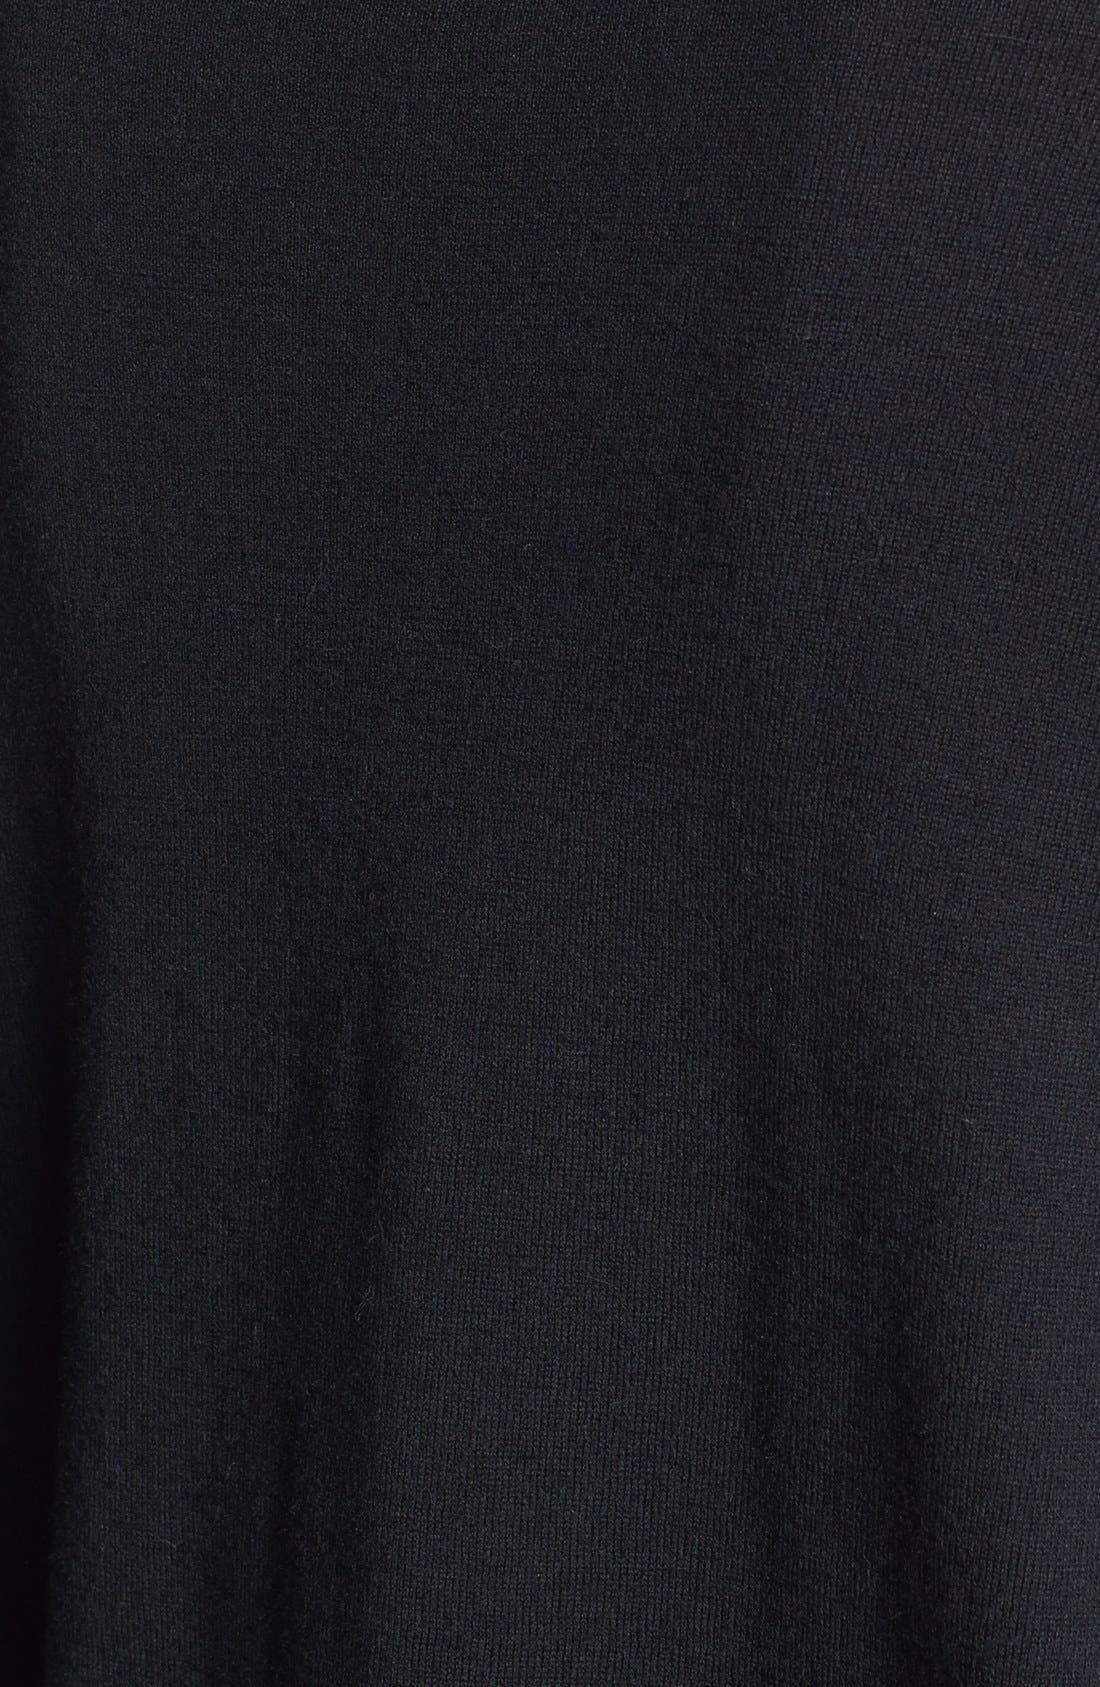 'Malena B.' Mixed Media Sweater,                             Alternate thumbnail 3, color,                             001